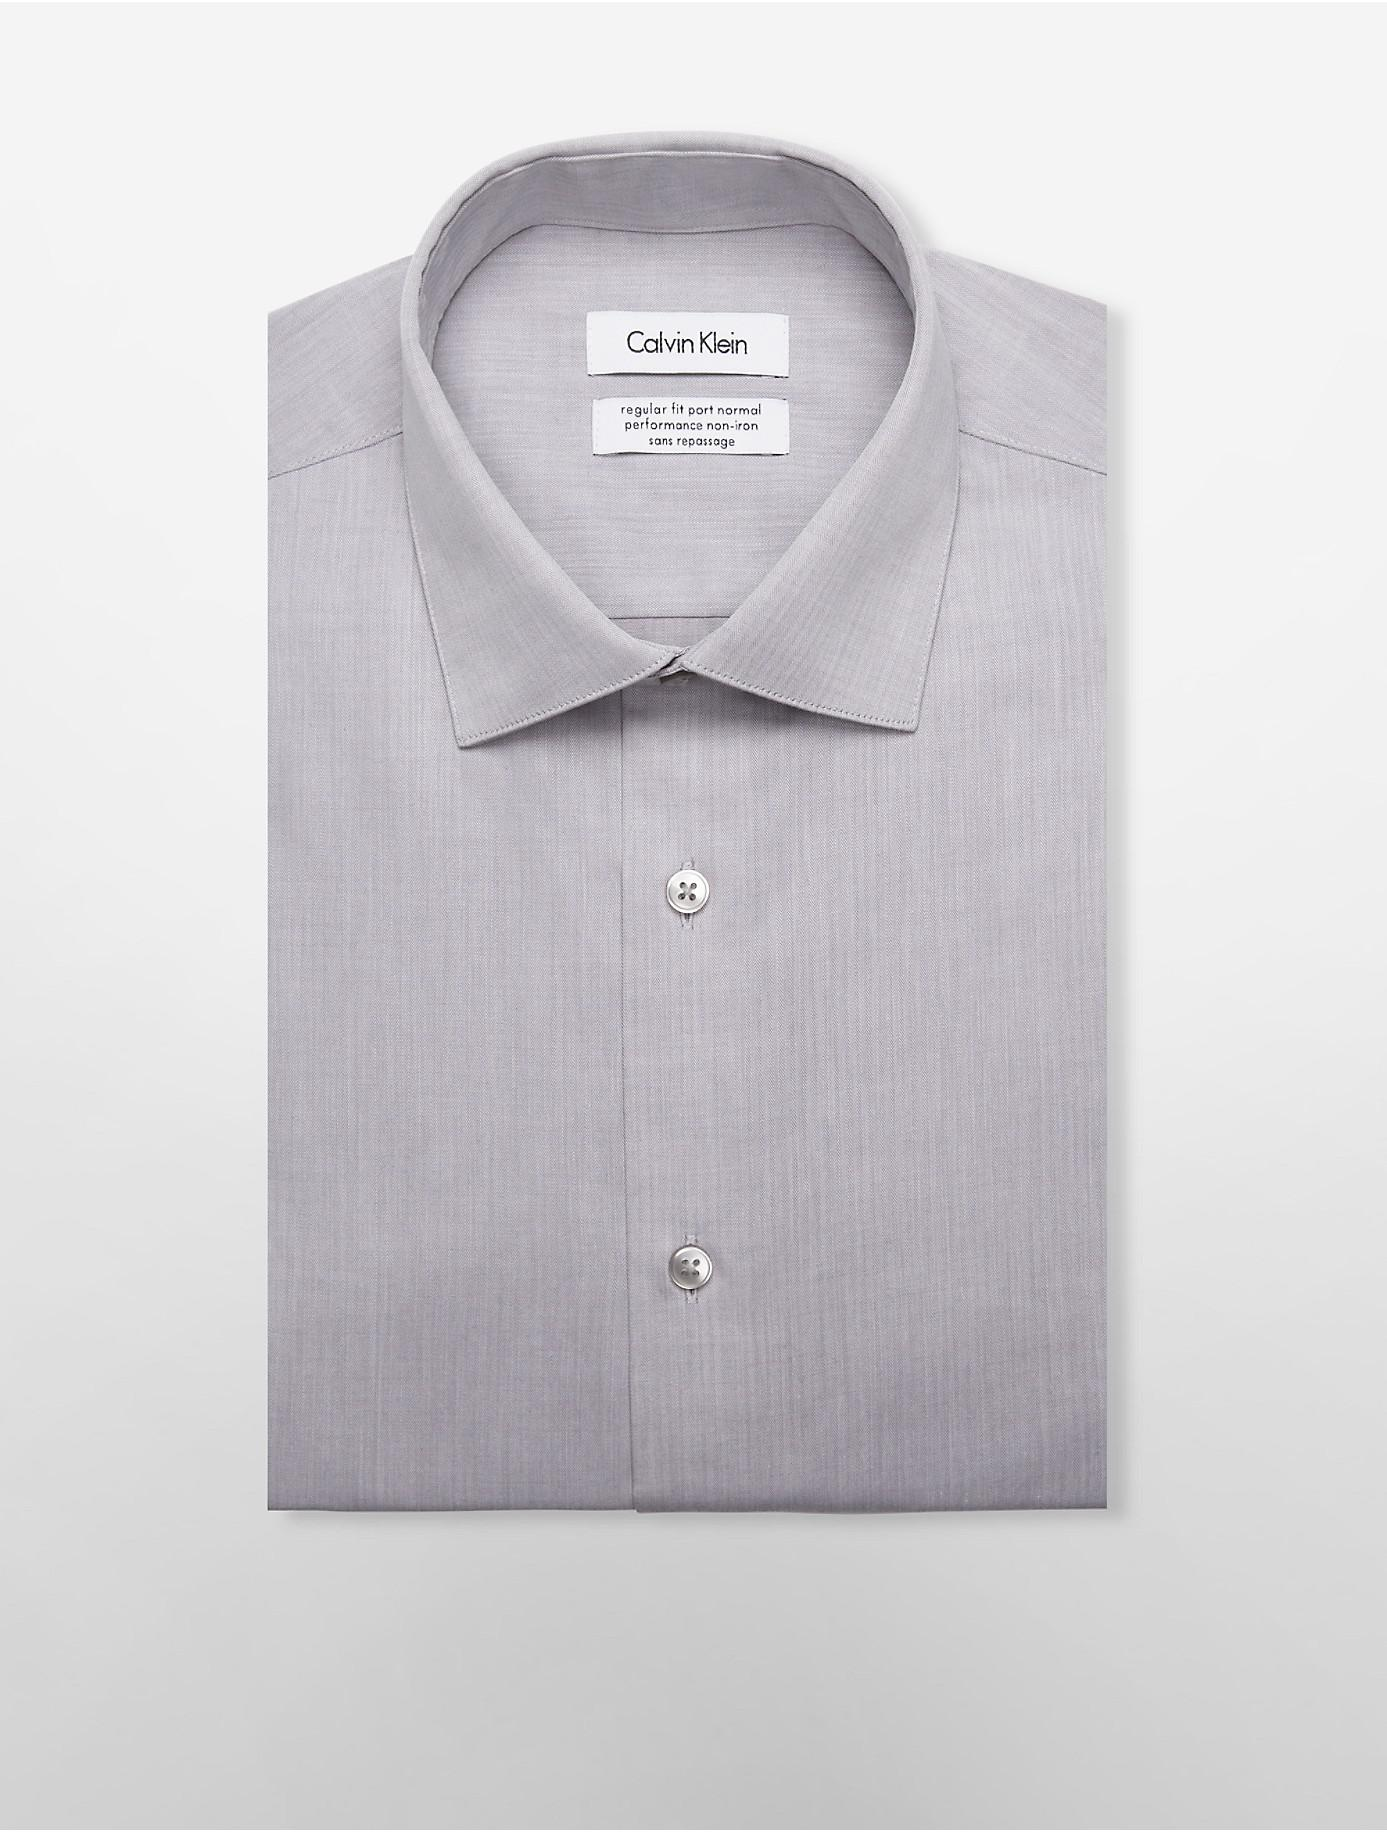 Lyst calvin klein steel regular fit non iron herringbone for White herringbone dress shirt